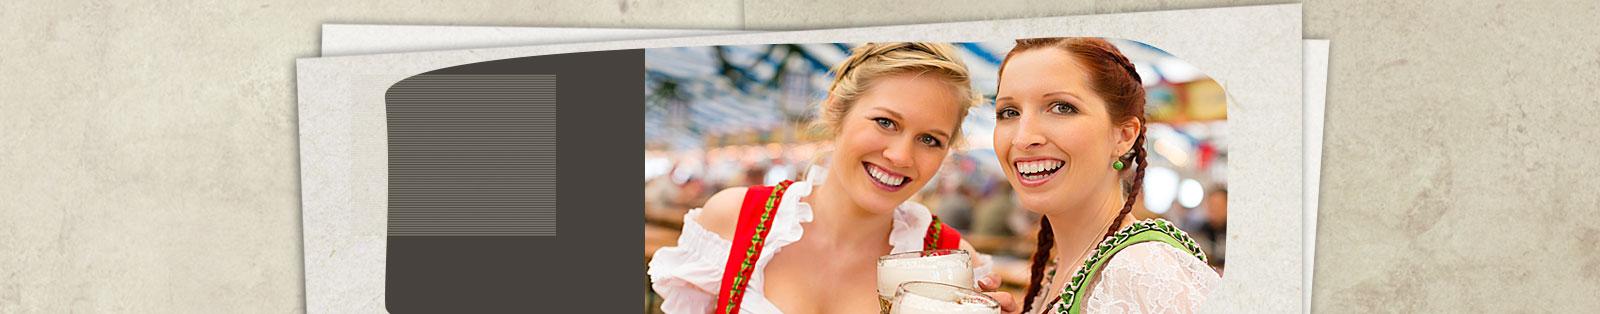 Birreria bavarese fra firenze ed empoli